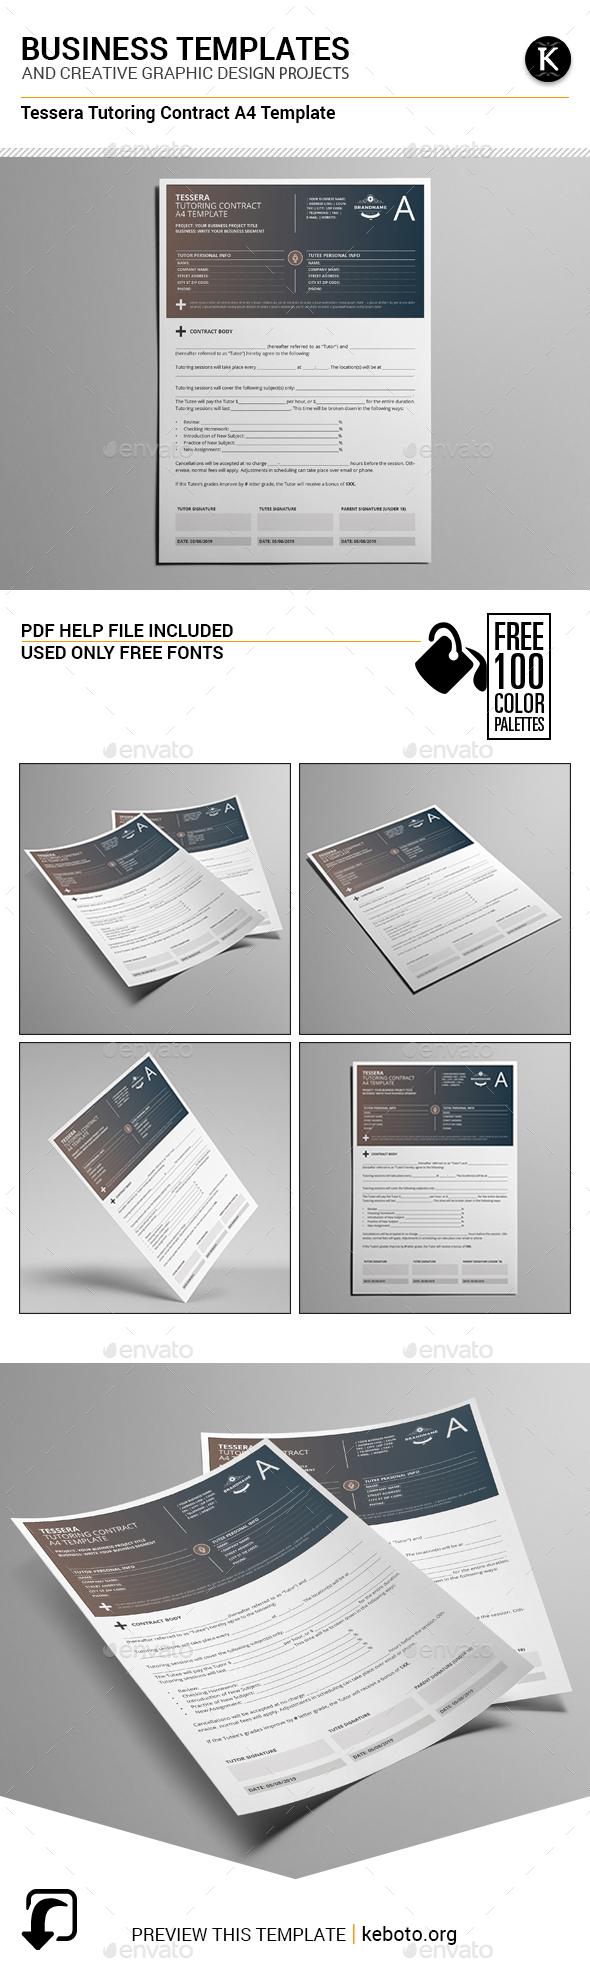 Tessera Tutoring Contract A4 Template - Miscellaneous Print Templates